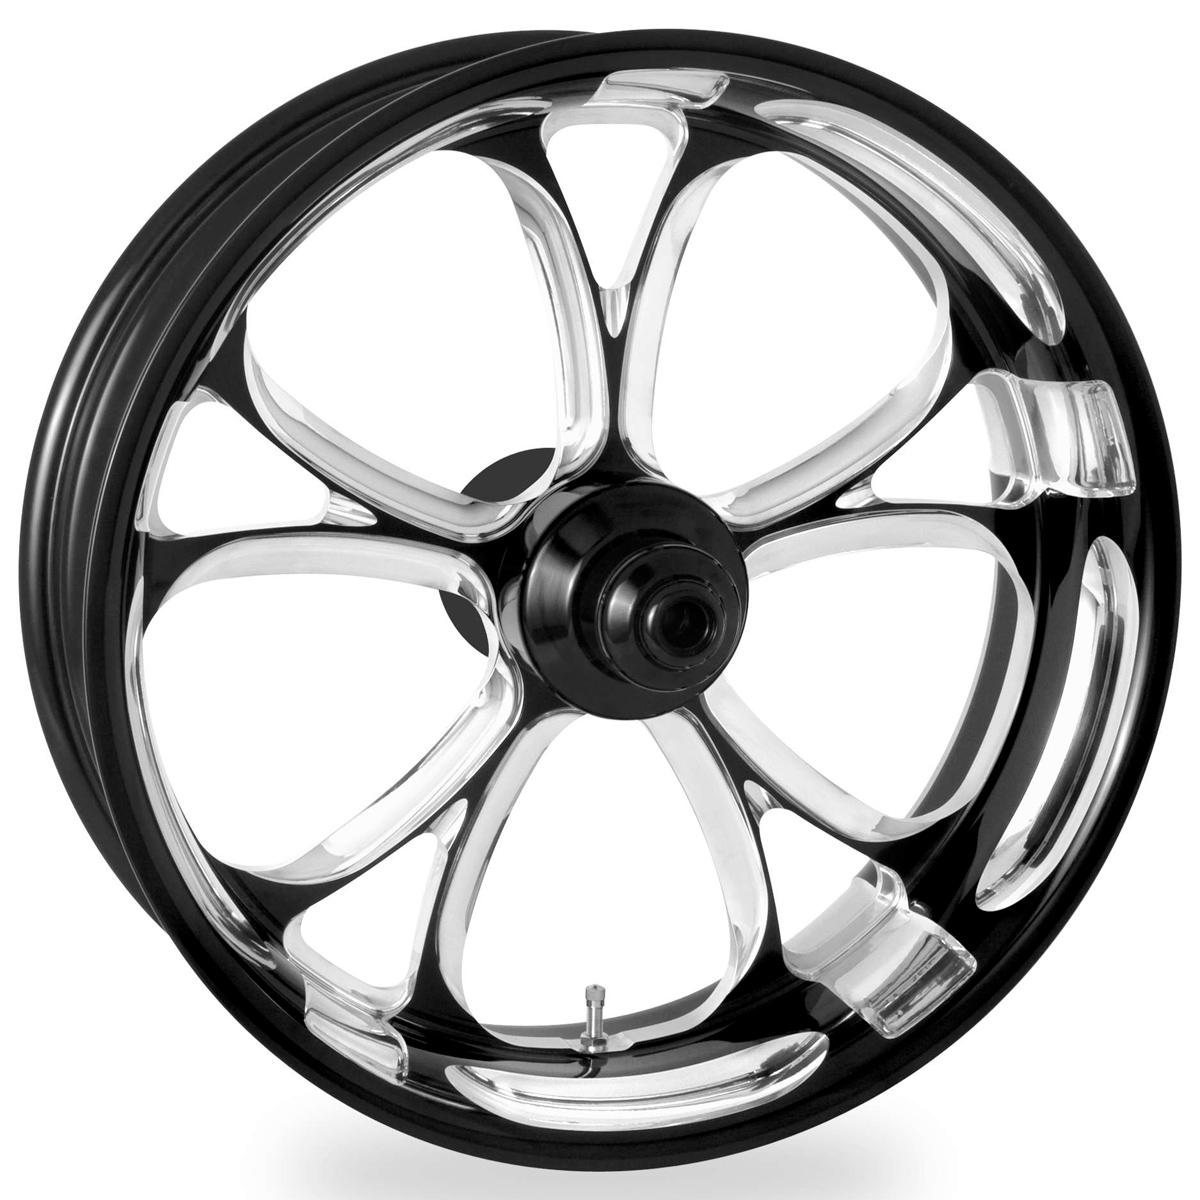 Performance Machine Luxe Platinum Cut Front Wheel 18x3.5 Non-ABS